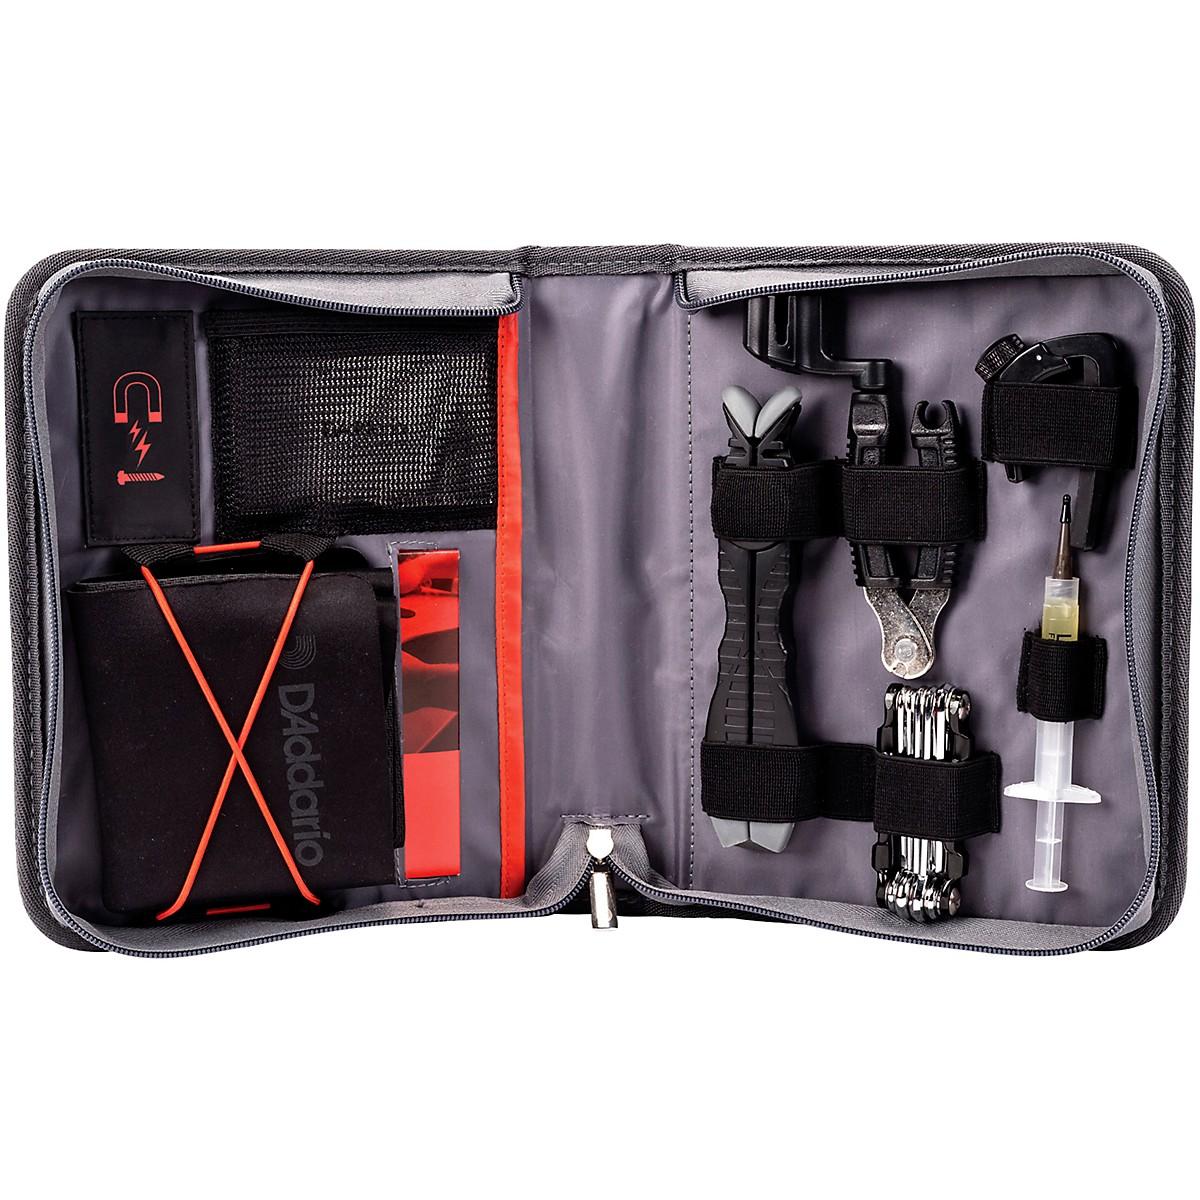 D'Addario Planet Waves Premium Guitar Maintenance Kit